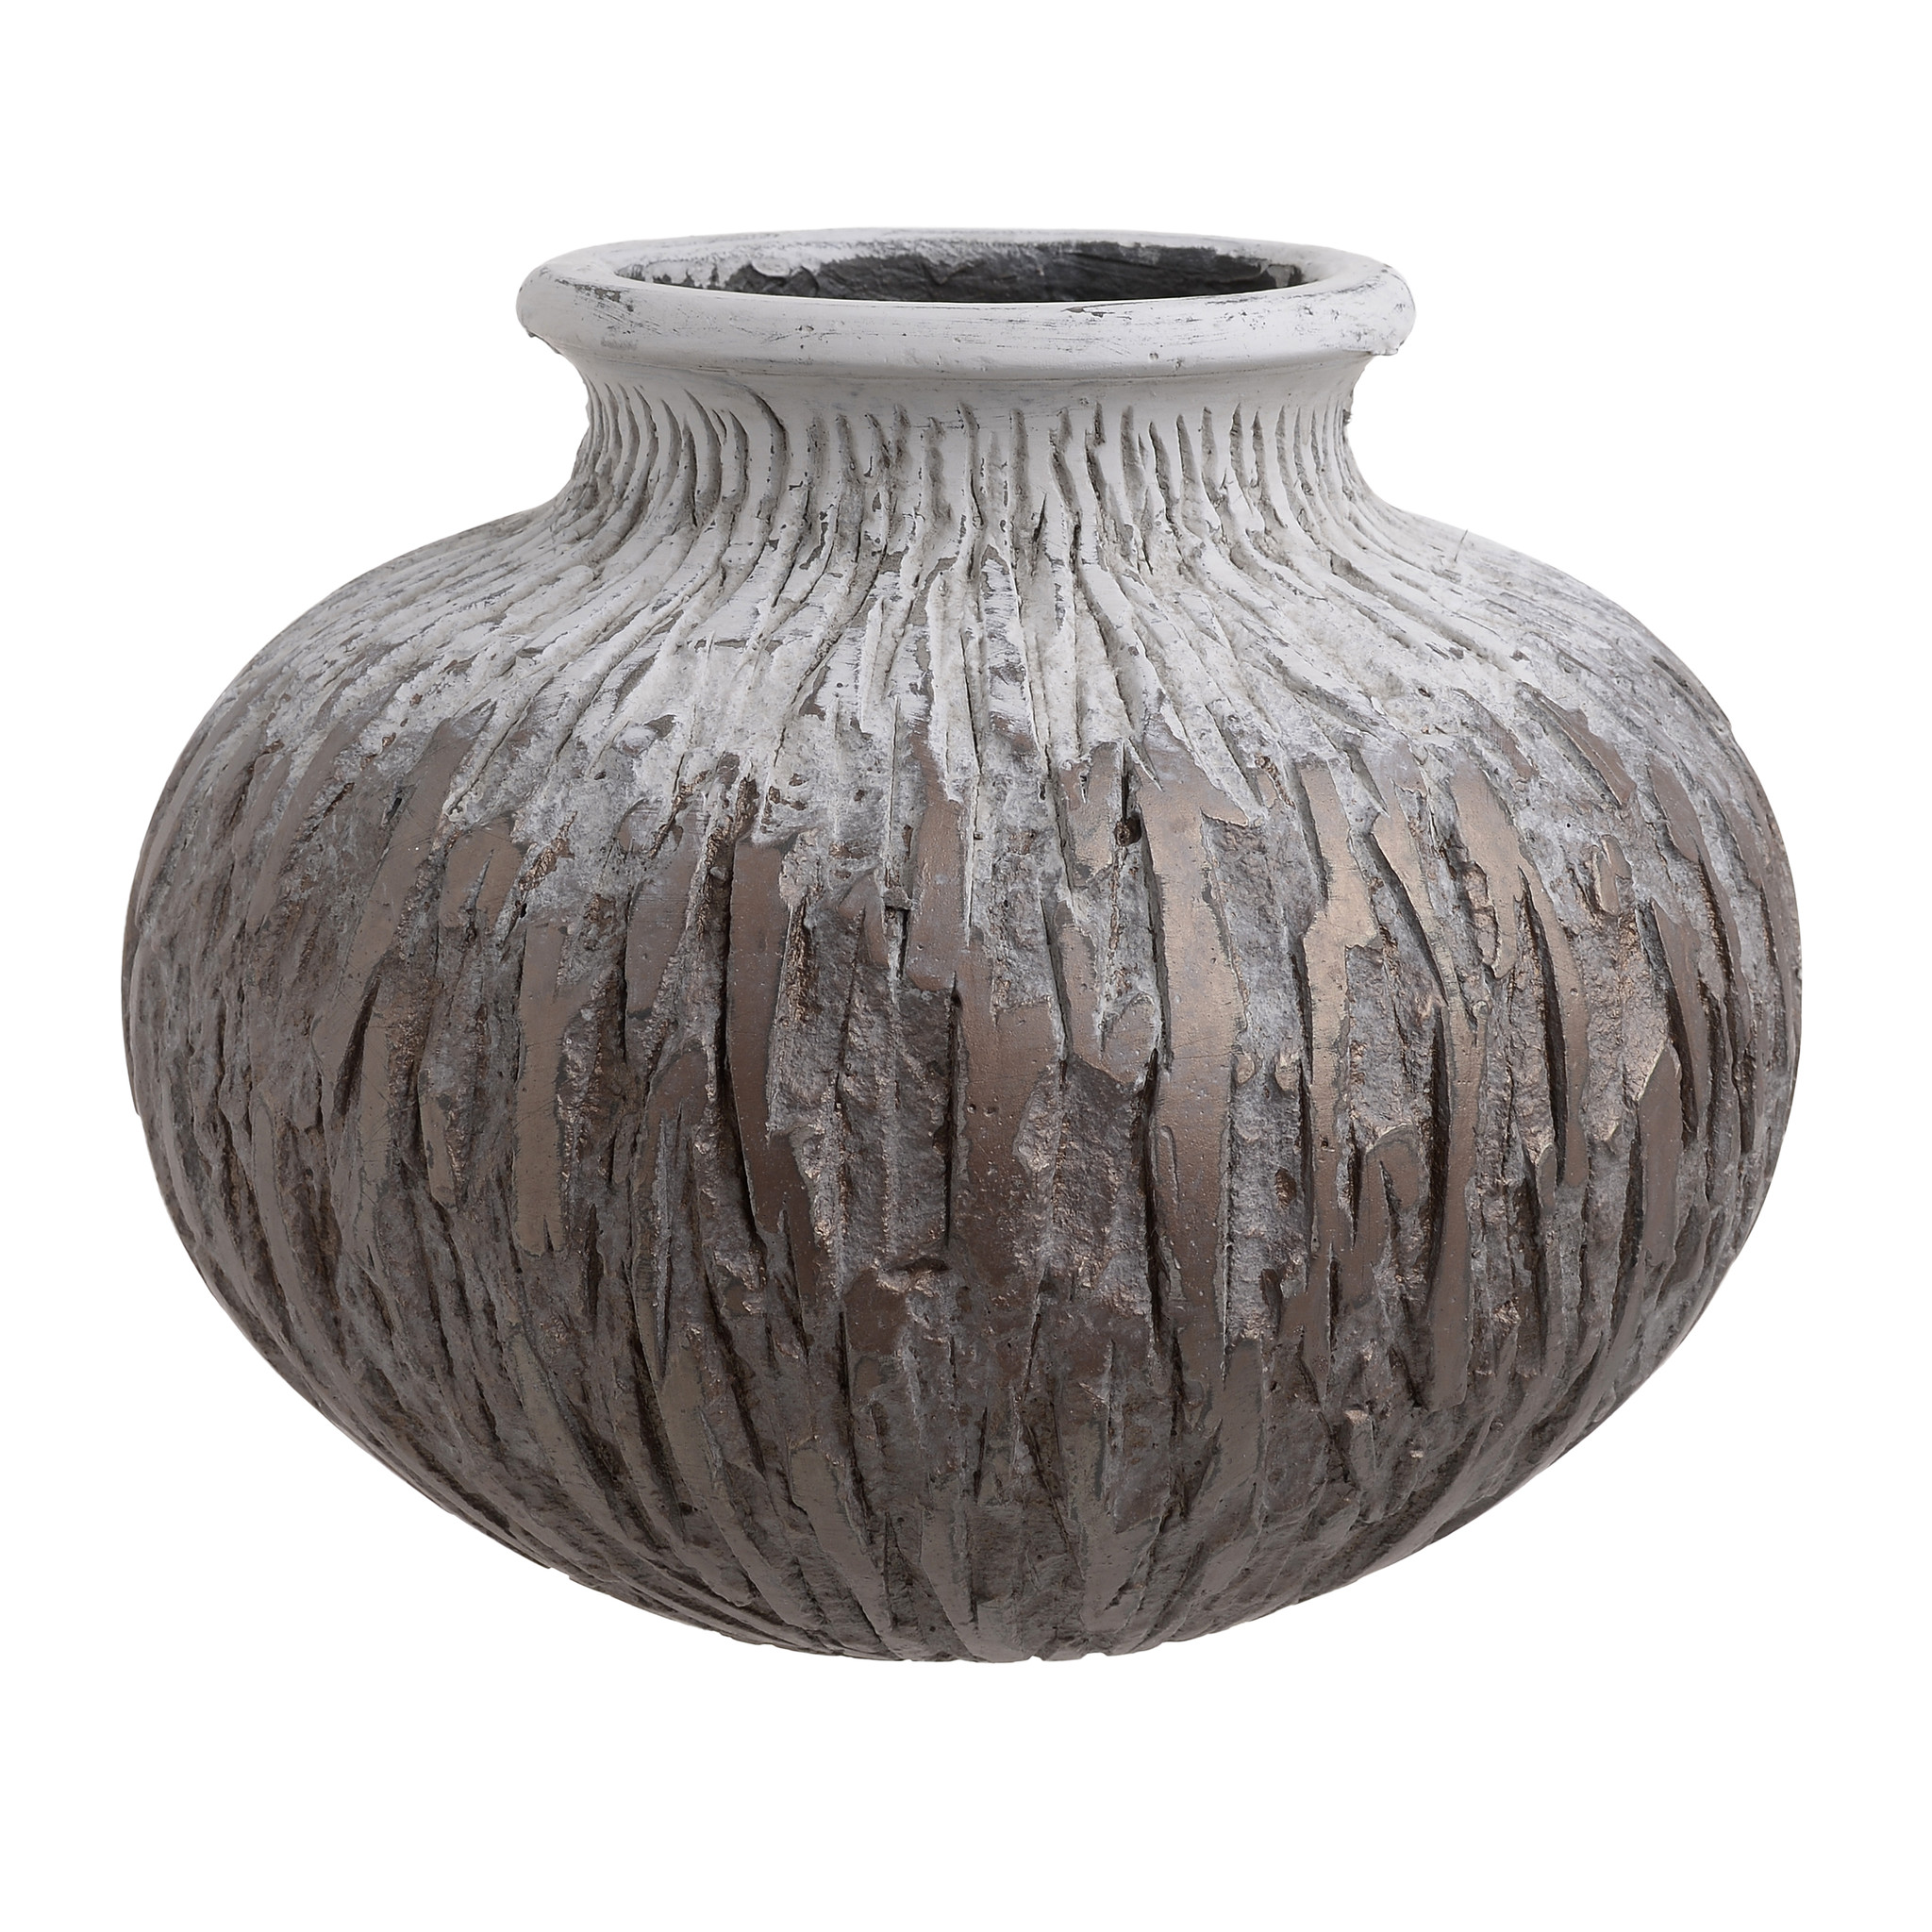 Ваза DanelВазы<br><br><br>Material: Керамика<br>Ширина см: 31<br>Высота см: 24<br>Глубина см: 31